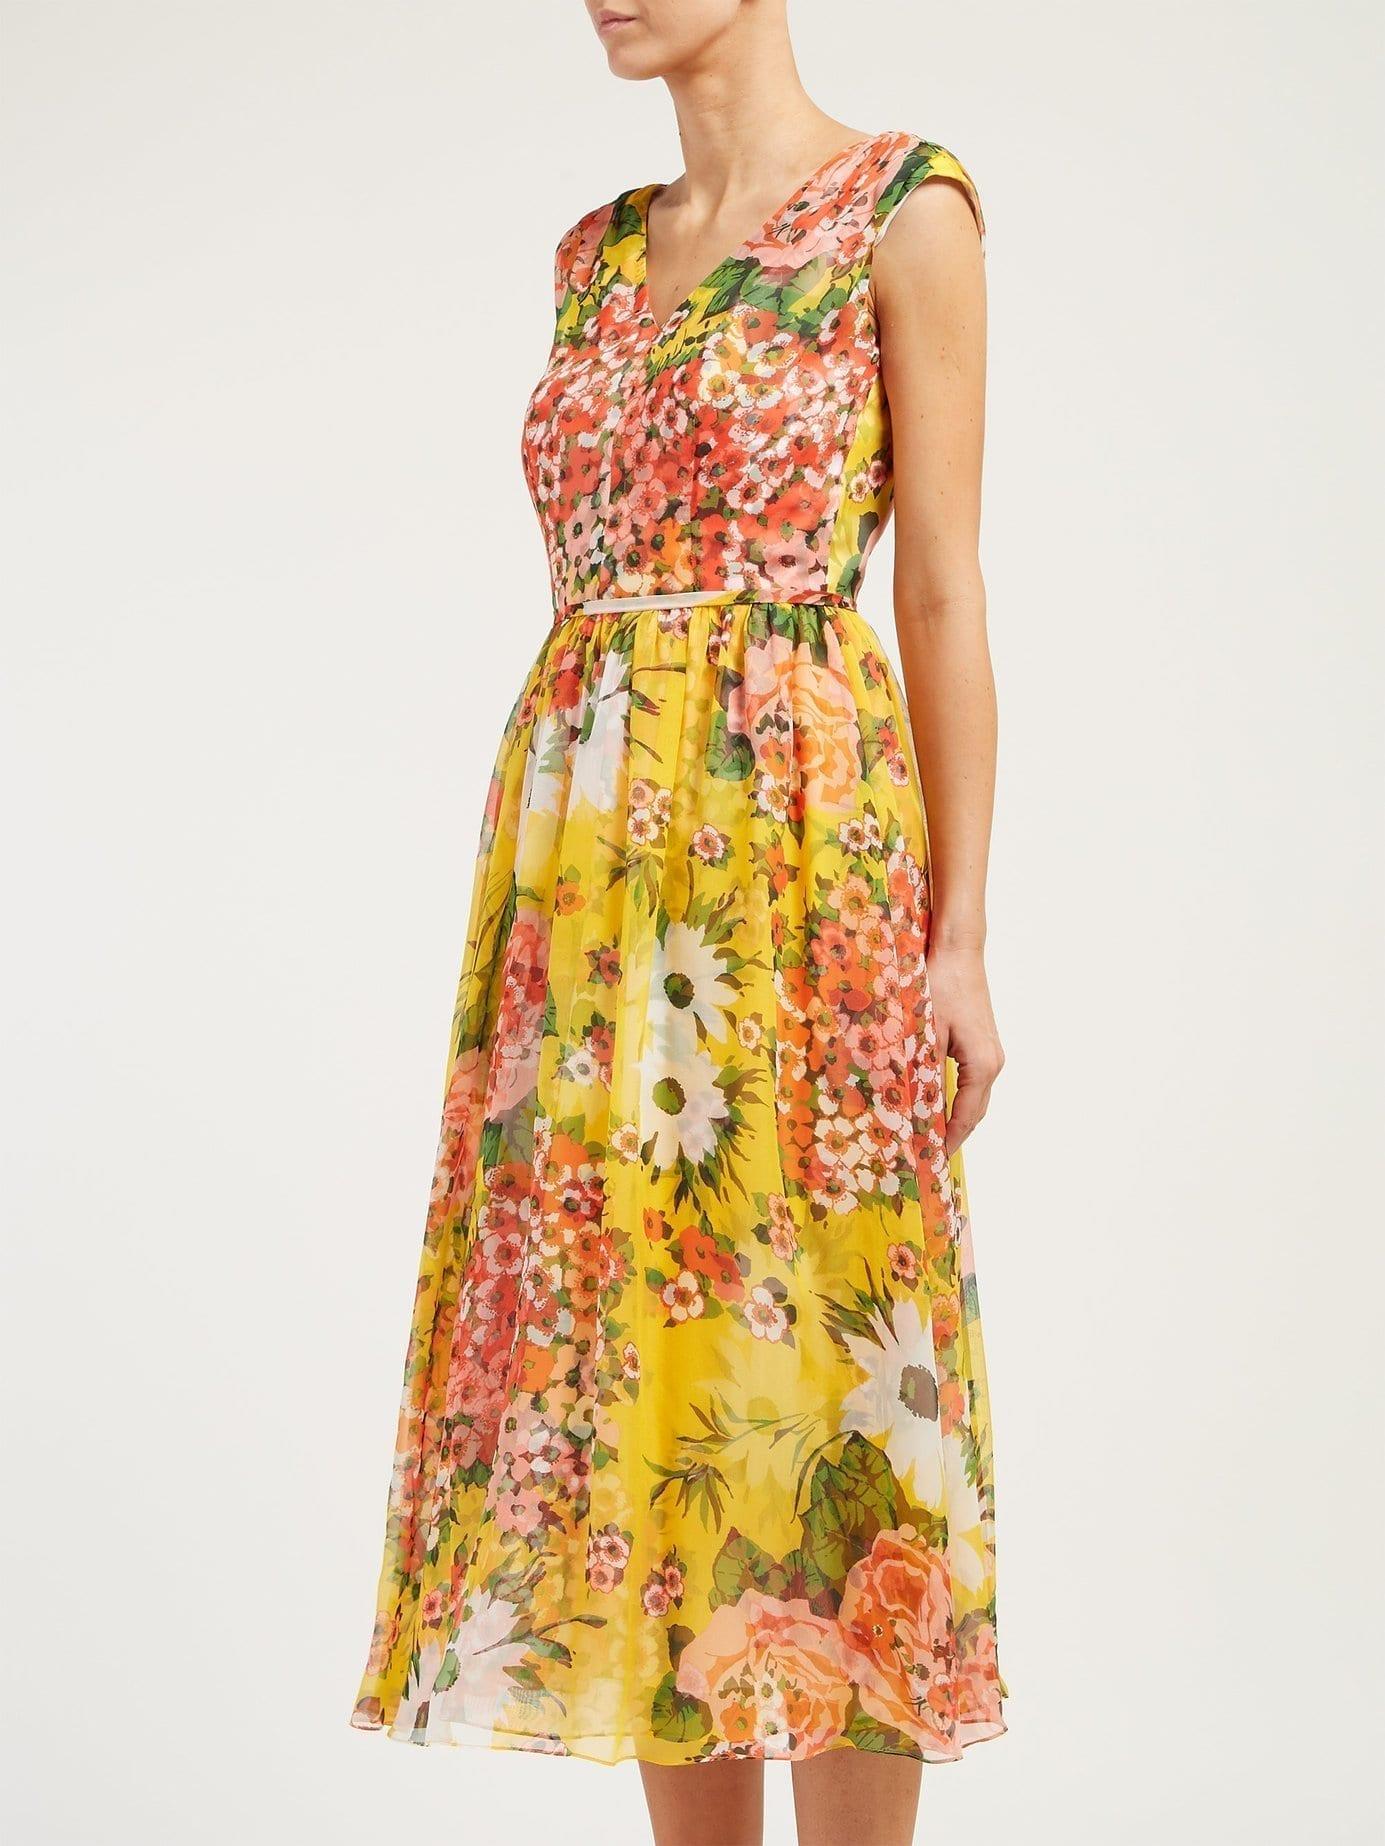 4e0037f15e08c CAROLINA HERRERA Floral-Print Silk-Chiffon Yellow Dress - We Select ...